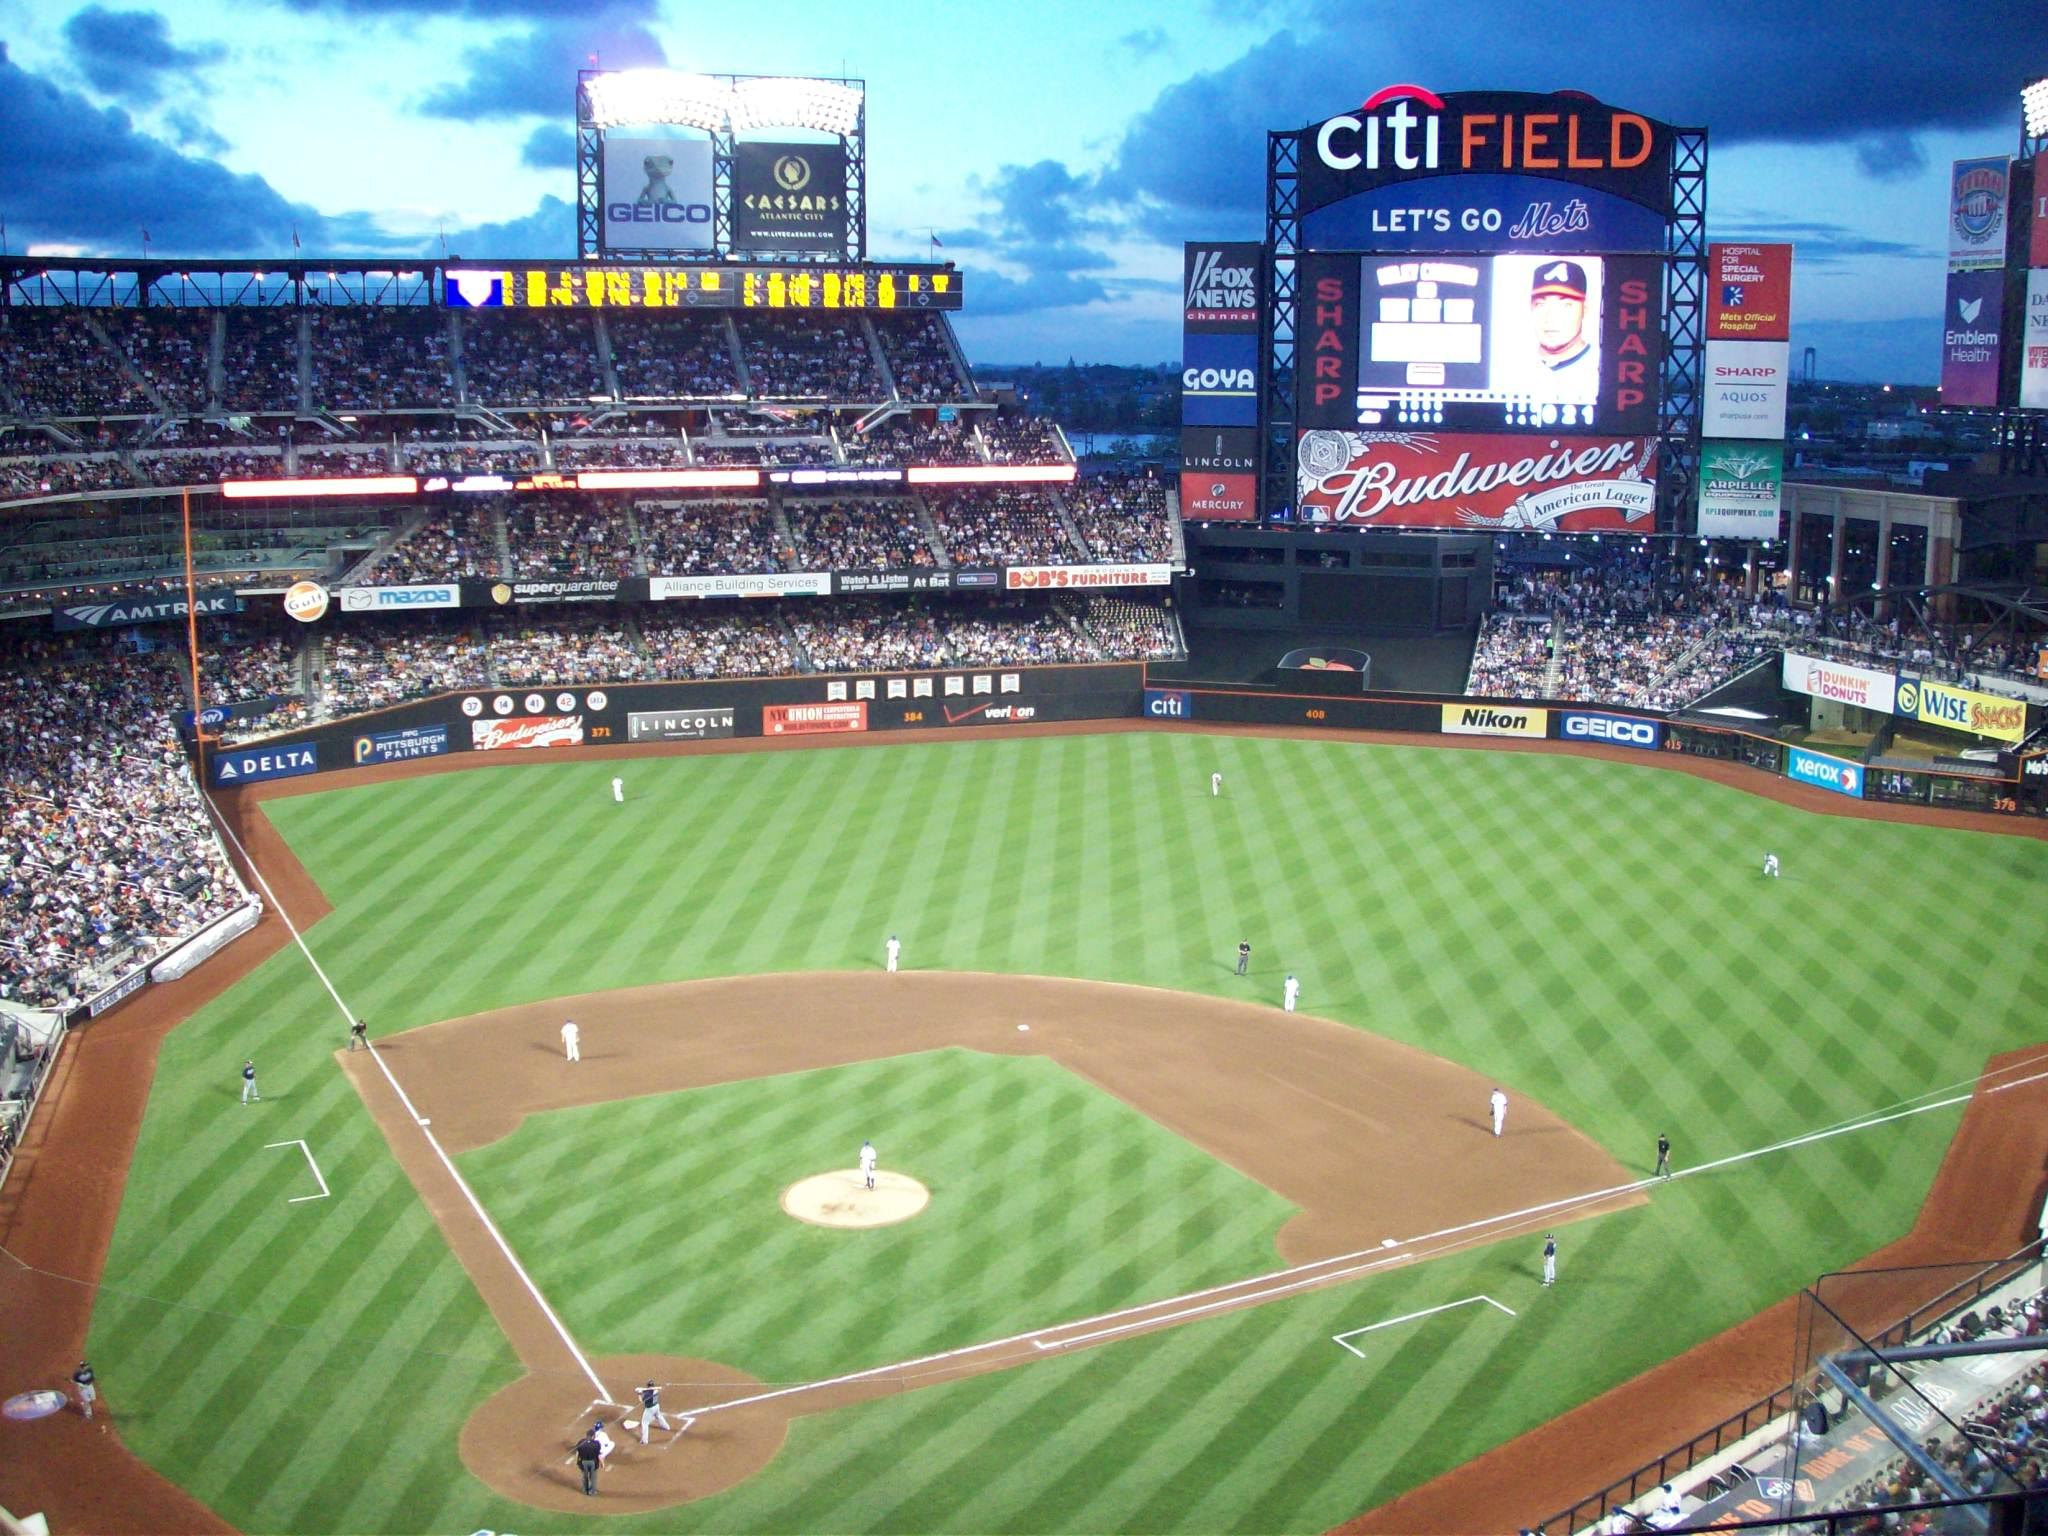 Madison Square Garden: New York City, NY (Citi Field And Heartland Brewery